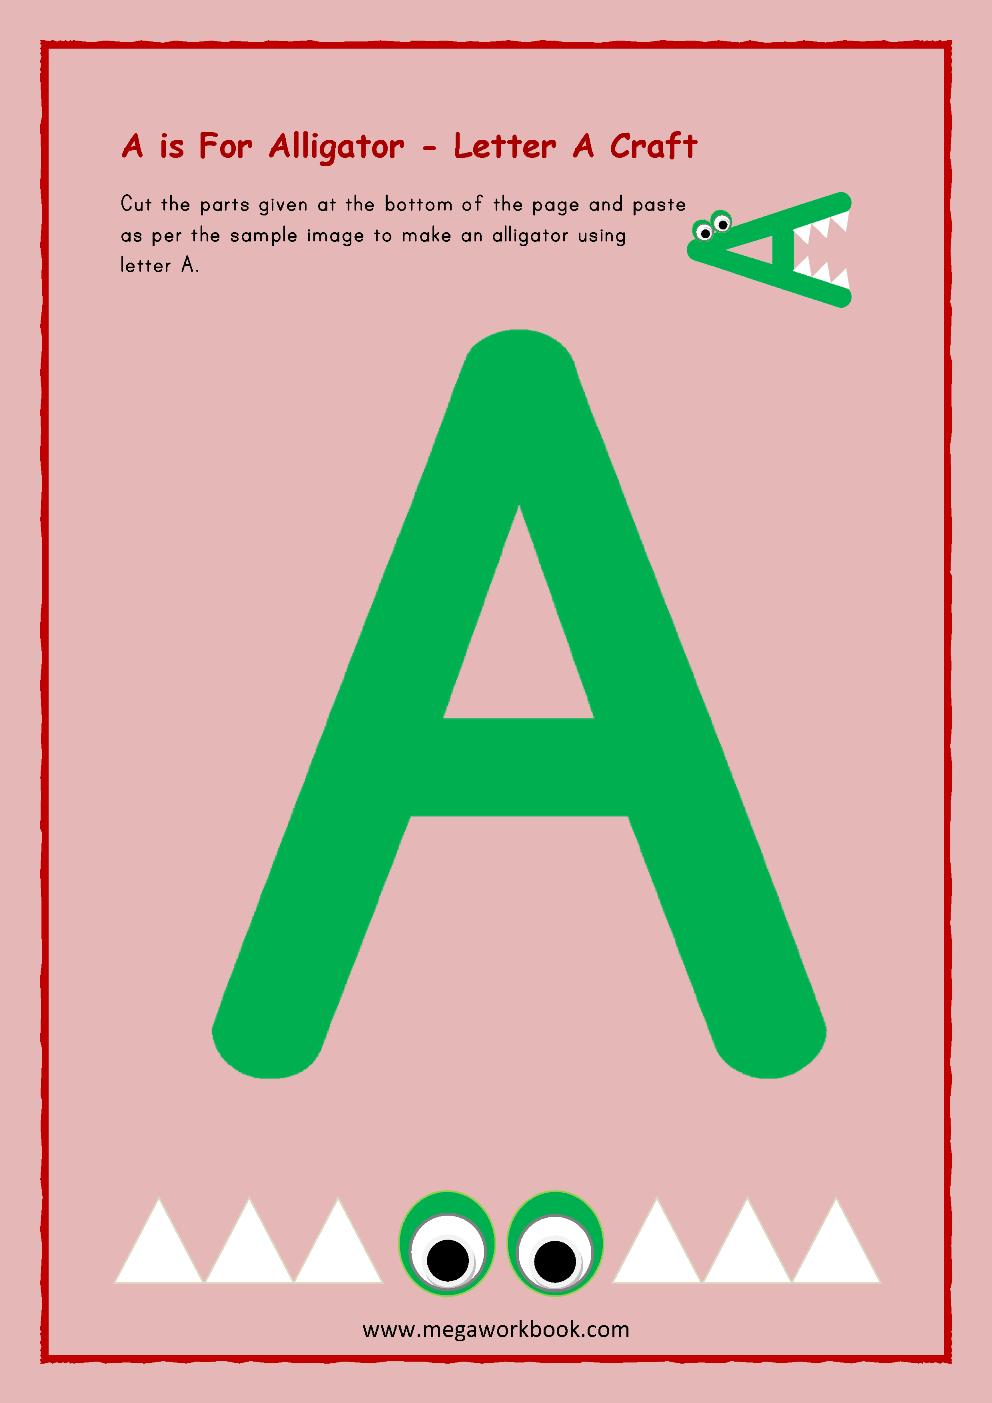 Letter A Activities Letter A Worksheets Letter A Activity Printables For Preschool And Kindergarten Megaworkbook